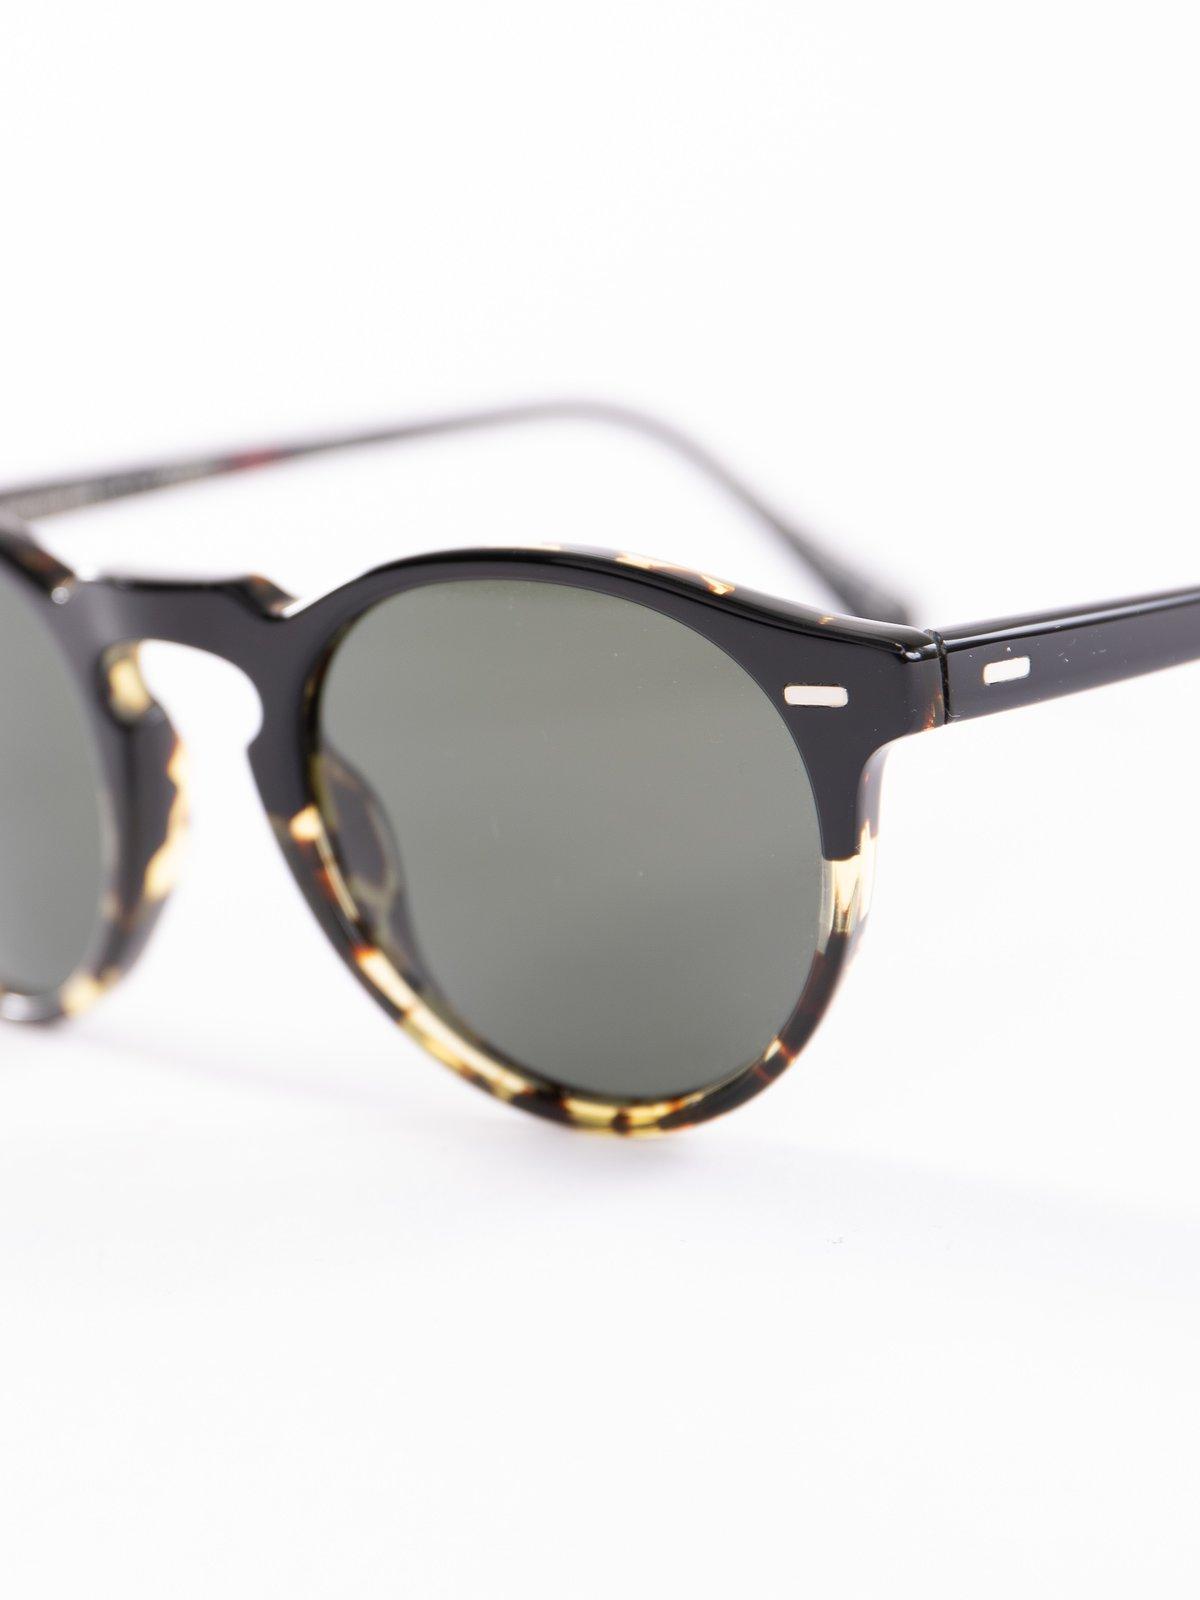 Black–DTBK Gradient/Green Polar Gregory Peck Sunglasses - Image 3